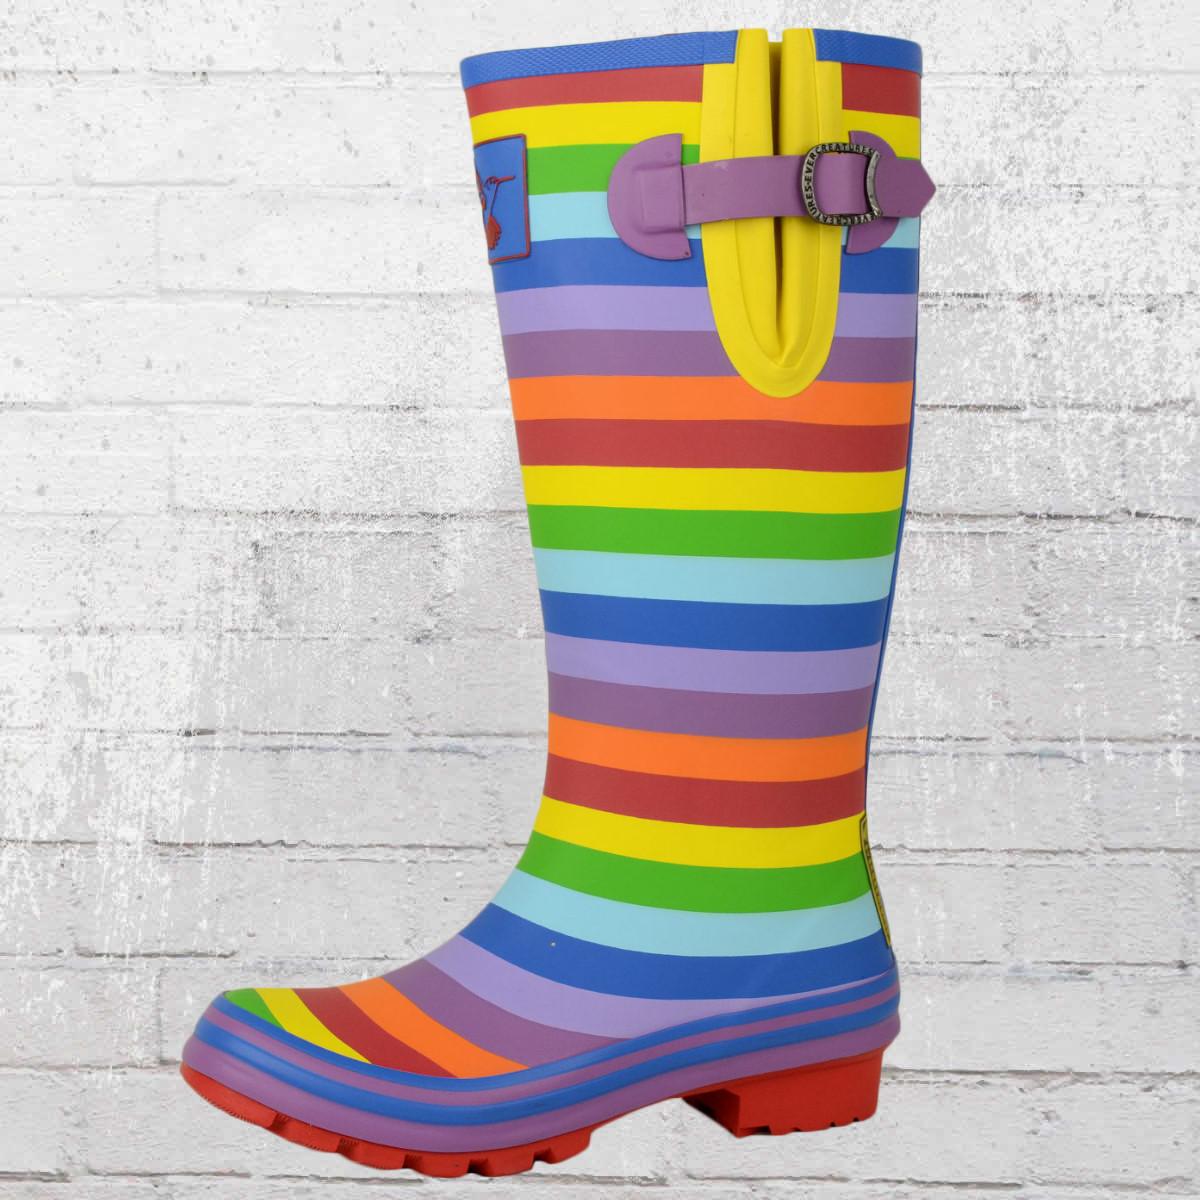 jetzt bestellen evercreatures gummistiefel damen rainbow. Black Bedroom Furniture Sets. Home Design Ideas